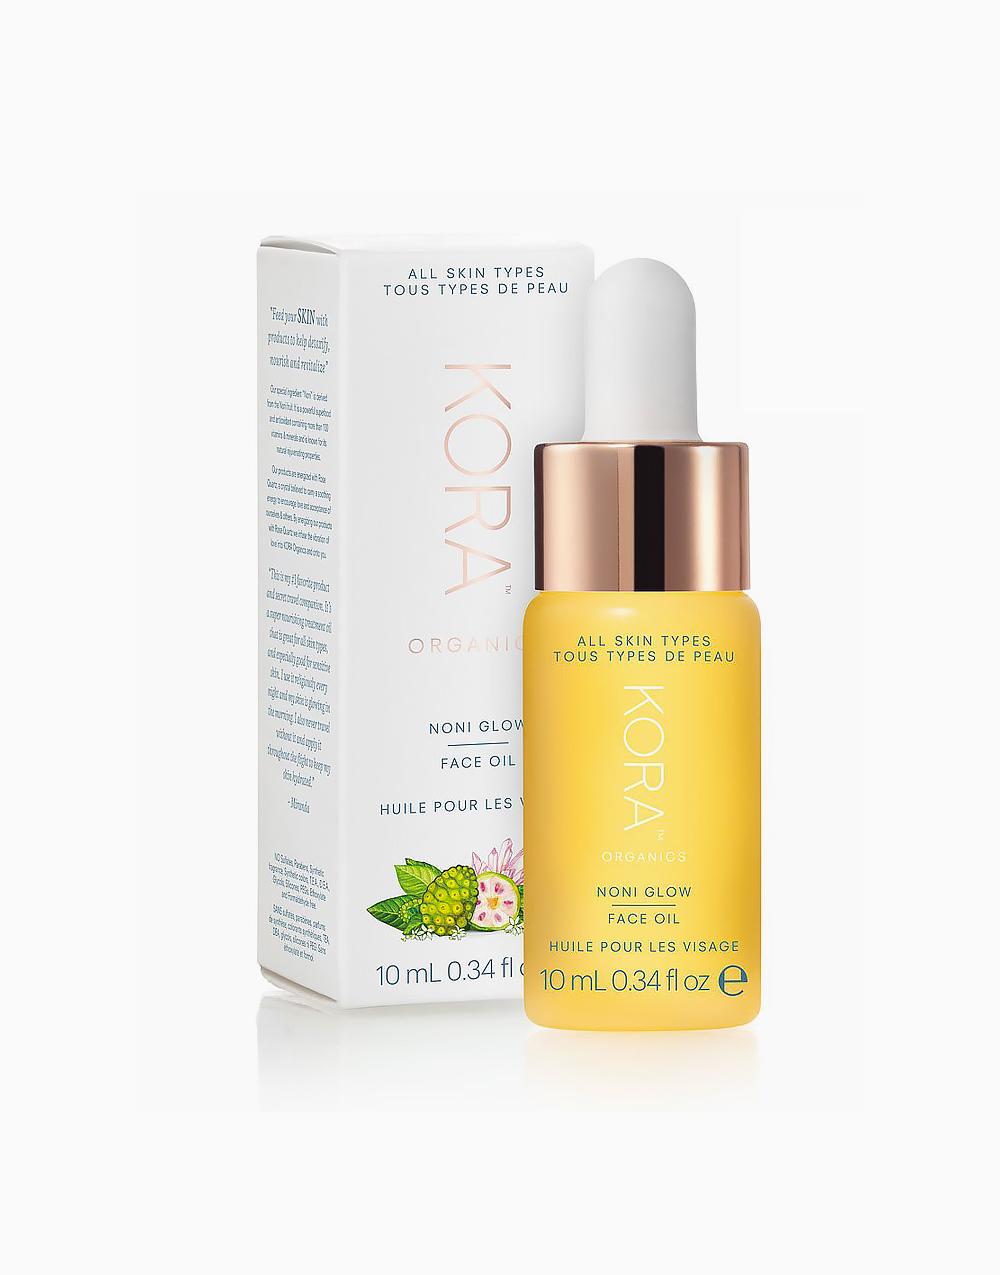 Noni Glow Face Oil (10ml) by Kora Organics